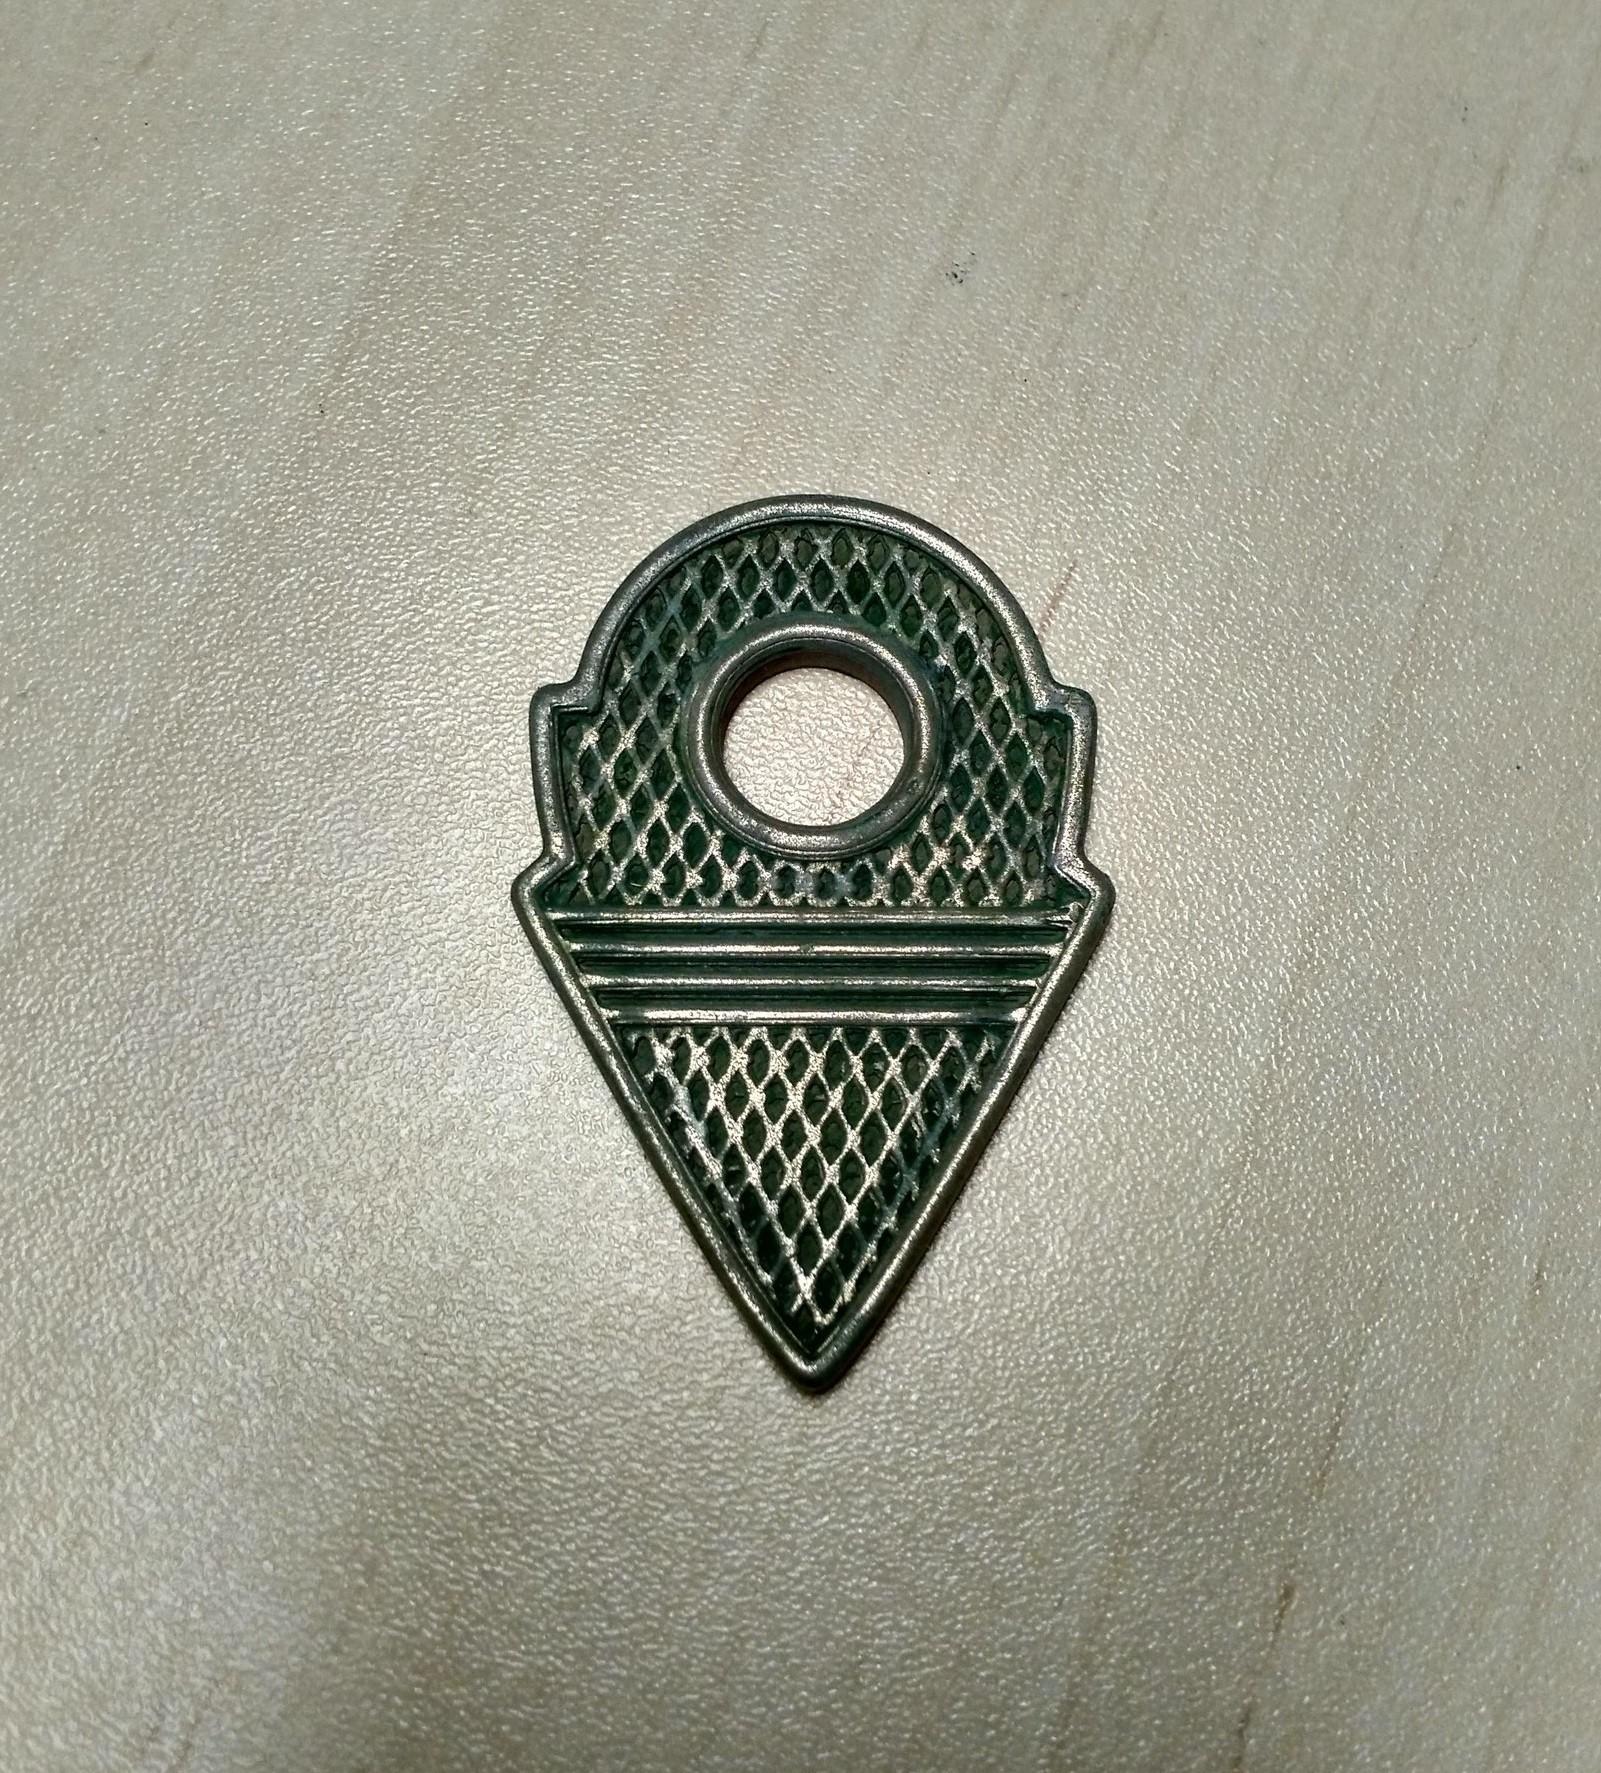 talhakimt.jpg Download STL file Talhakimt • 3D printing design, Rubot3D